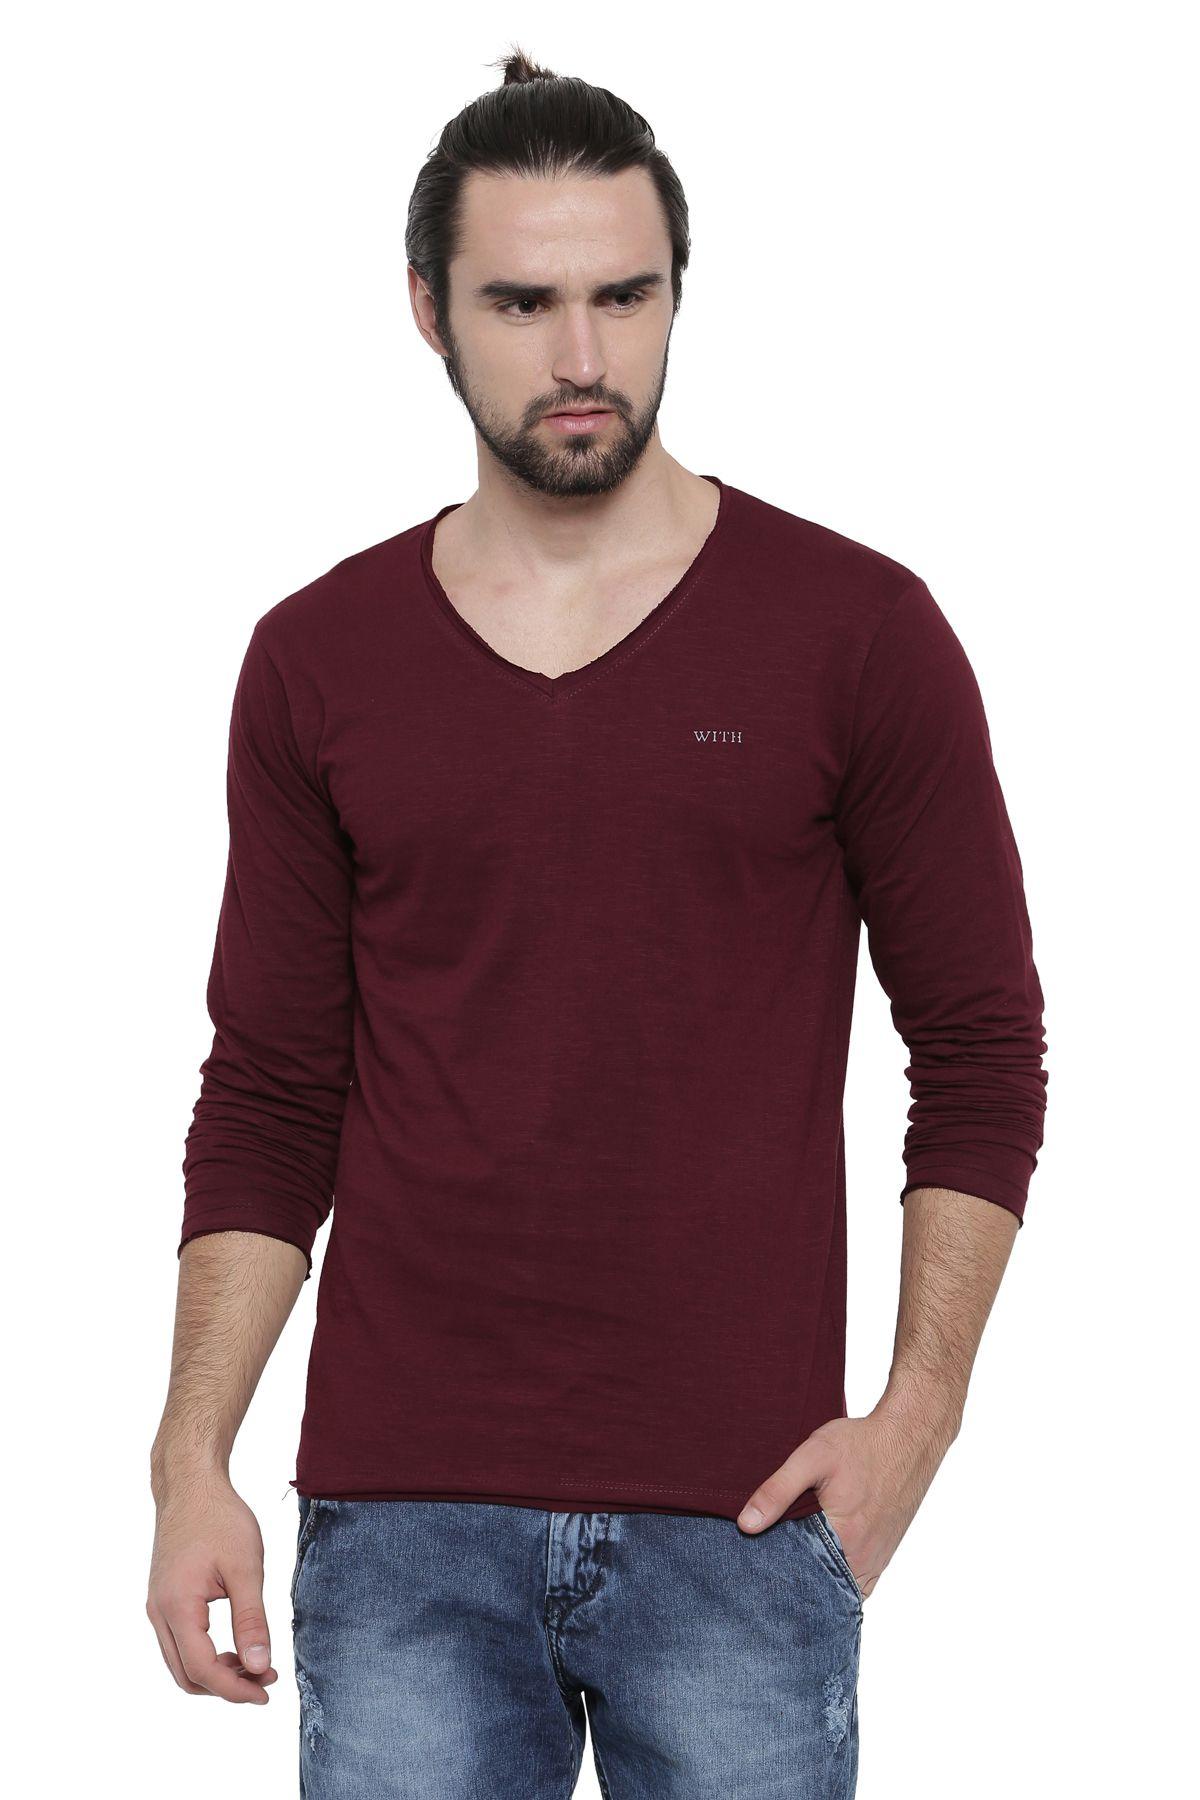 WITH White V-Neck T-Shirt